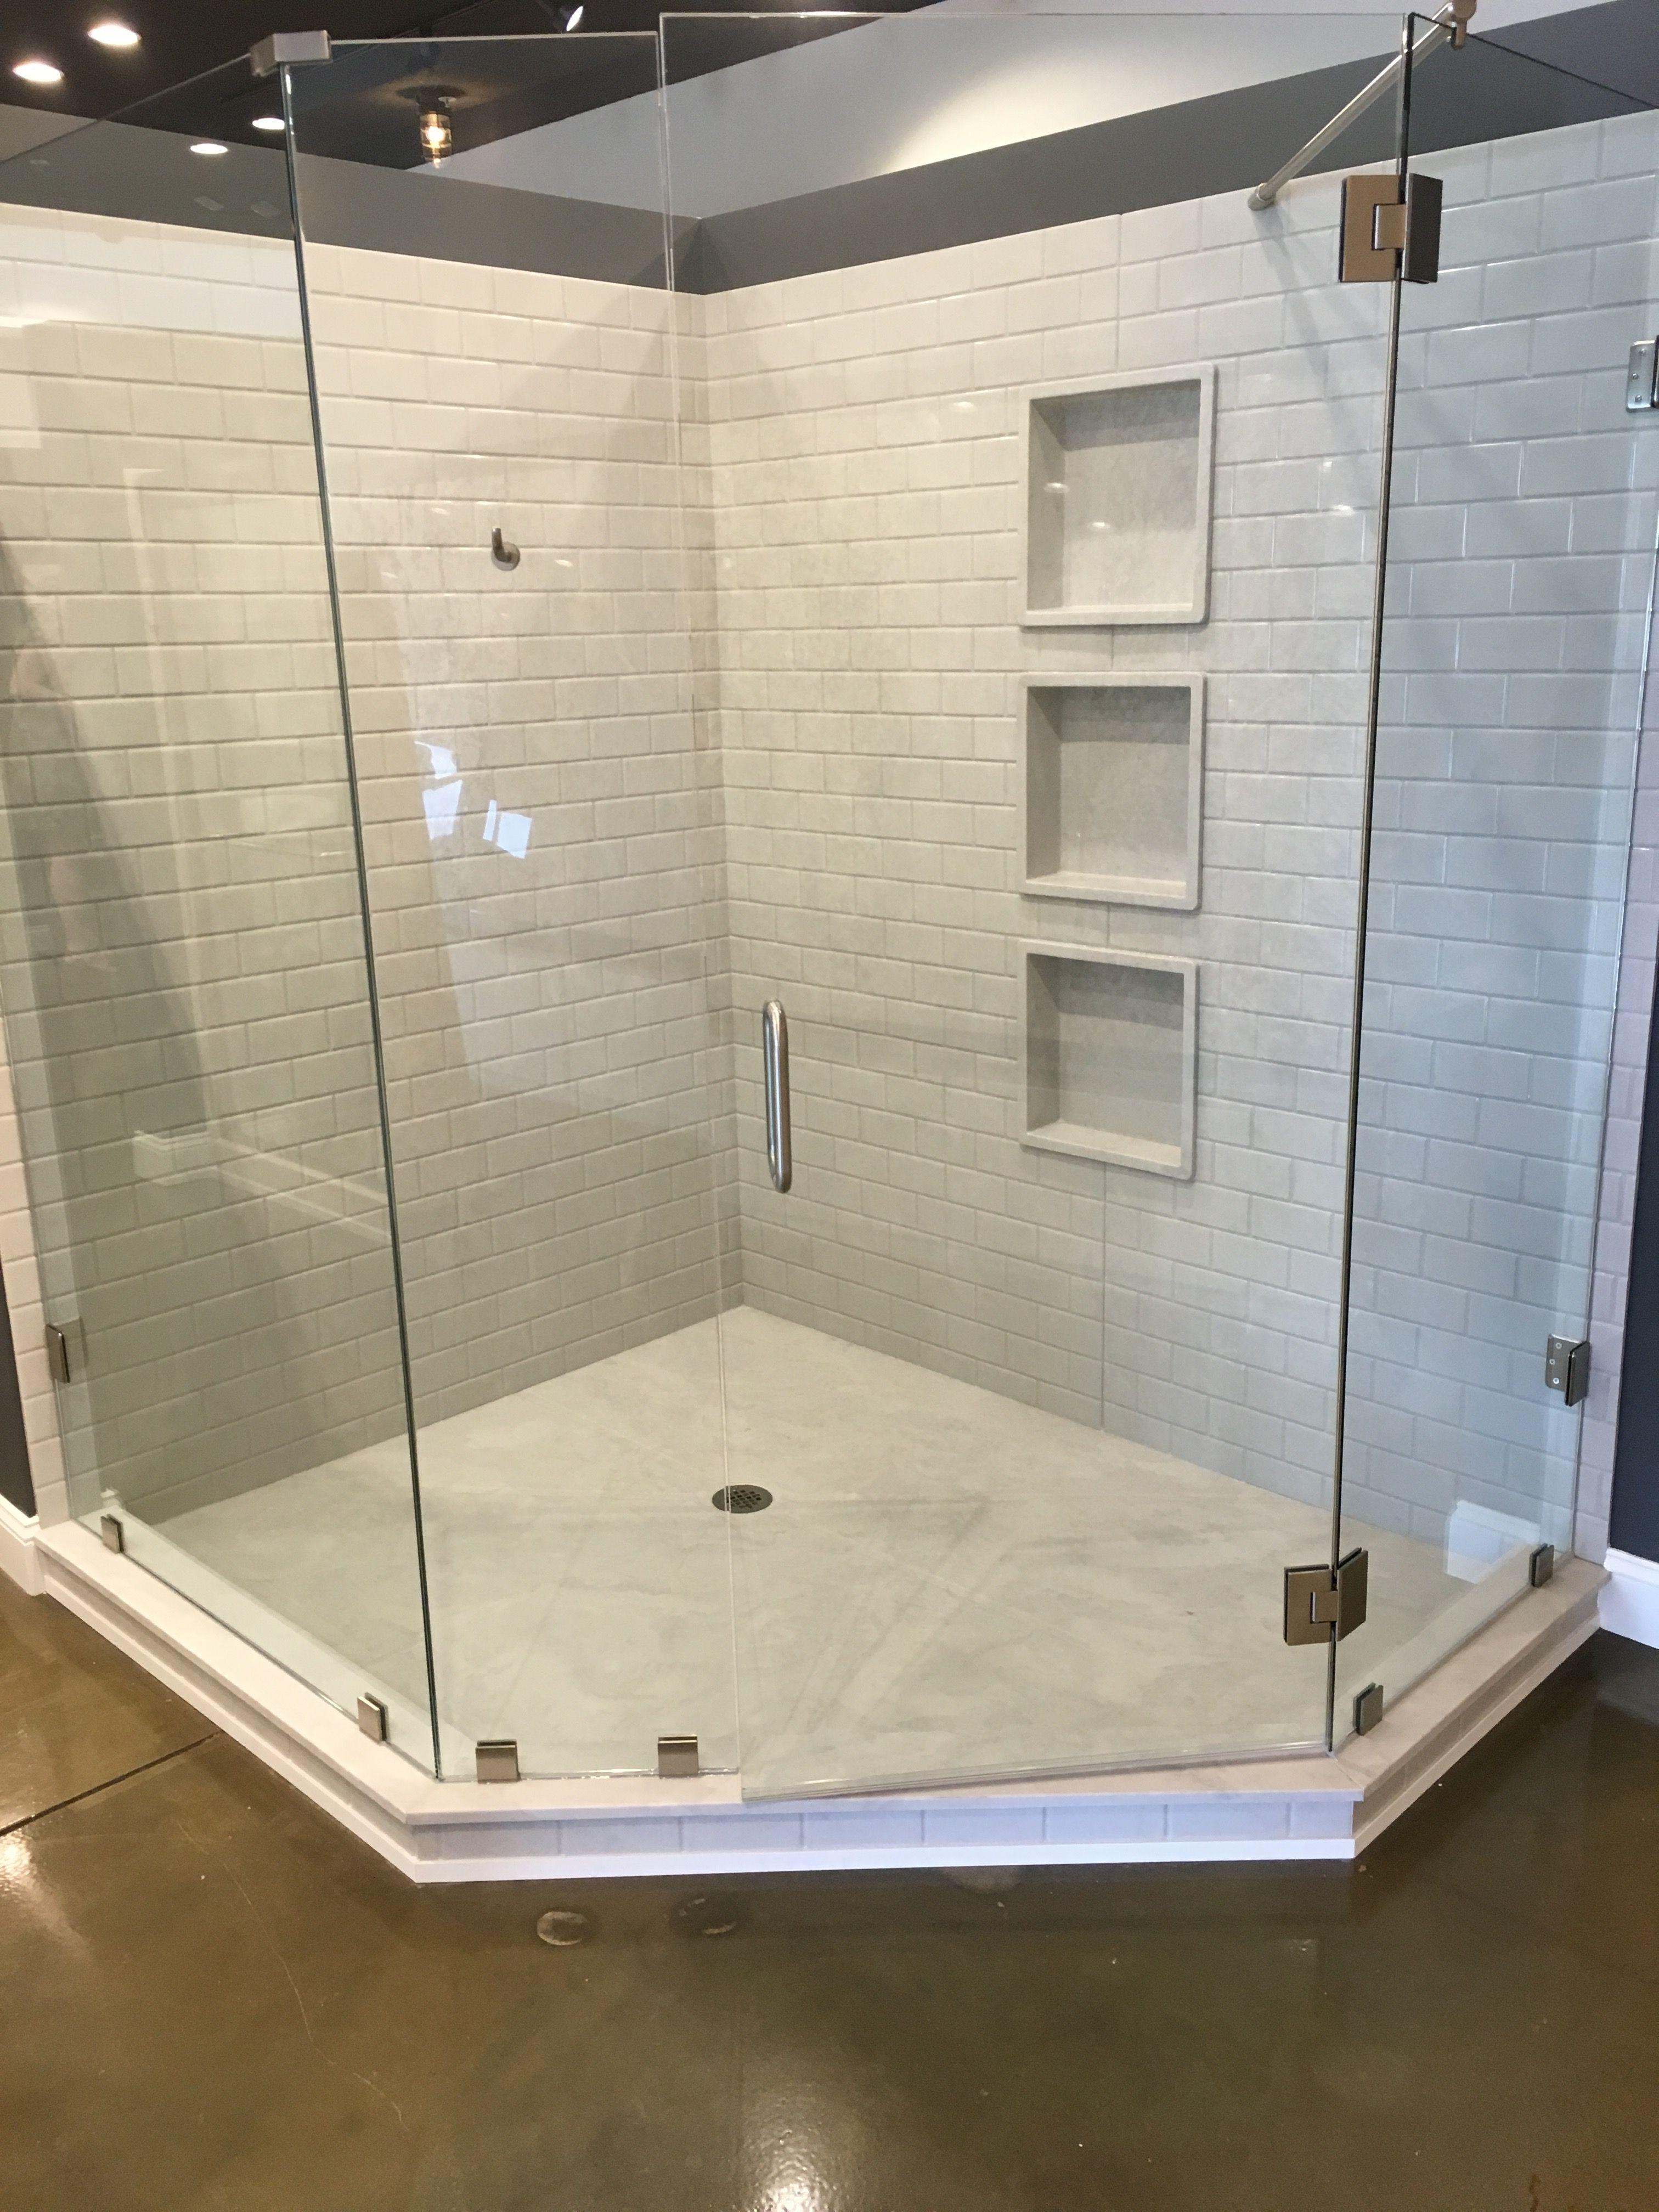 Subway Tile Cultured Marble Shower Walls Custom Shower Pan